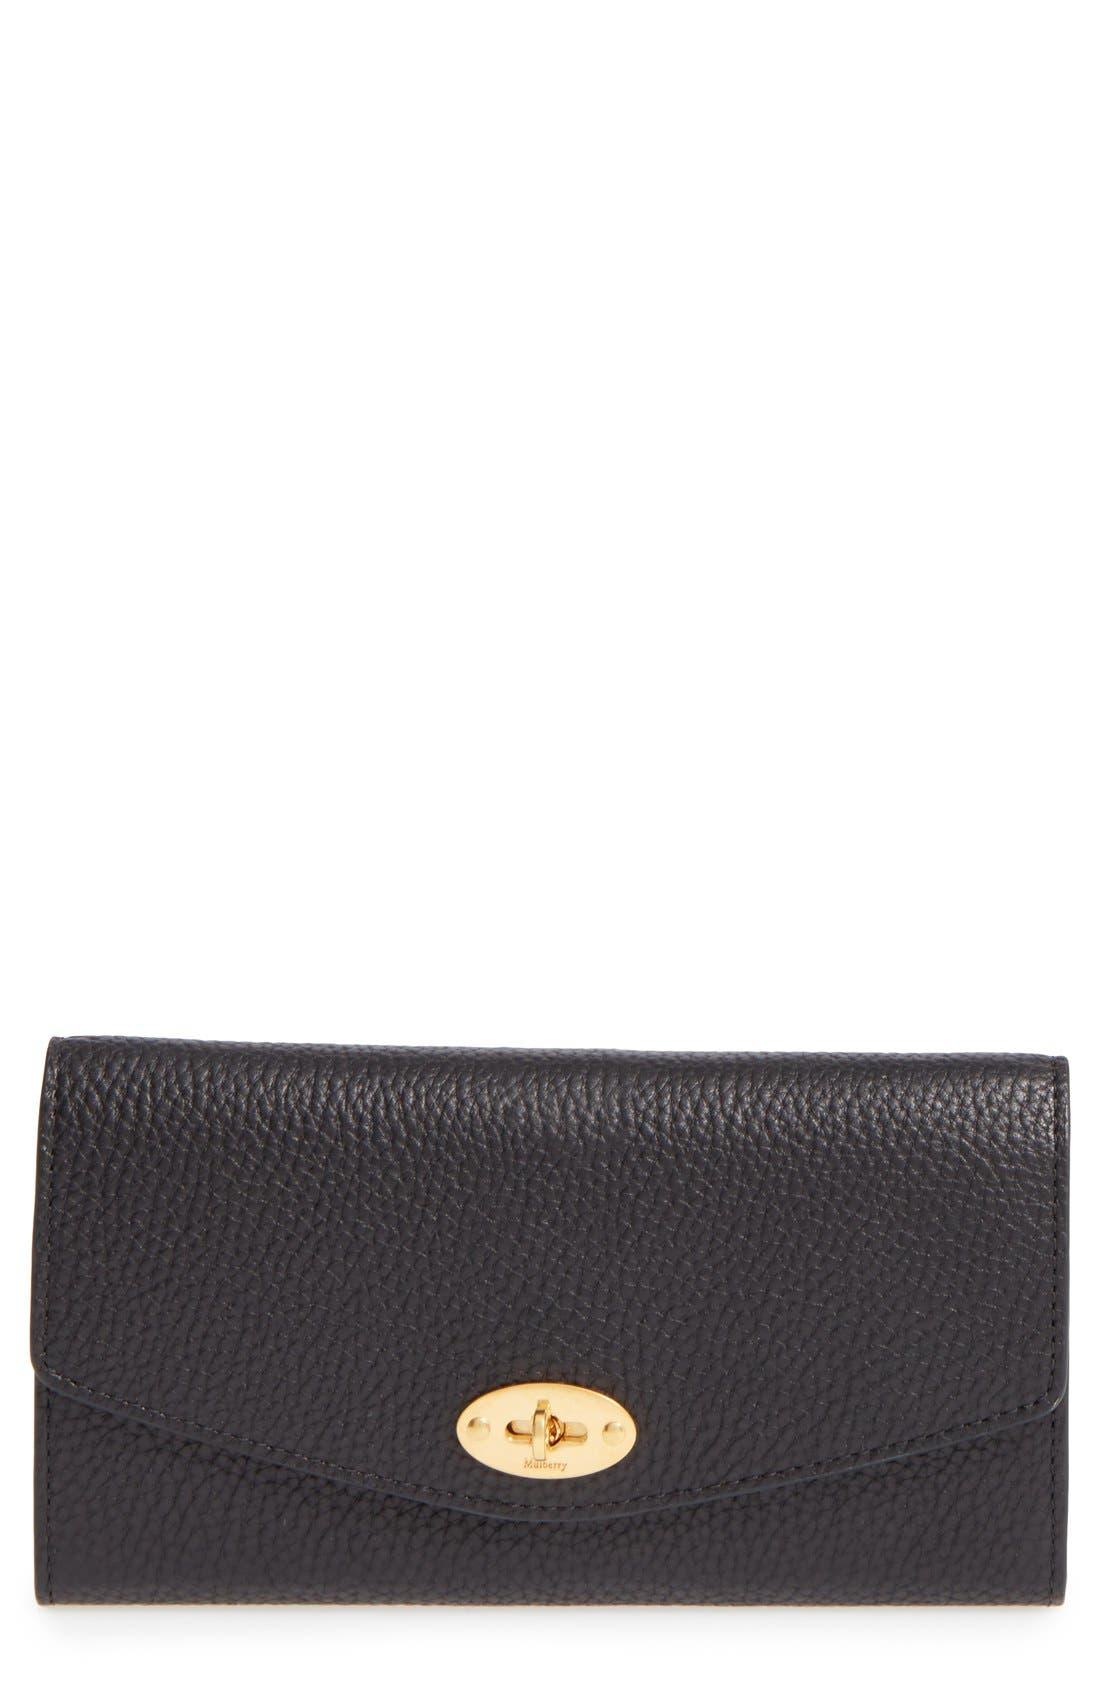 'Postman's Lock' Leather Wallet,                             Main thumbnail 1, color,                             BLACK